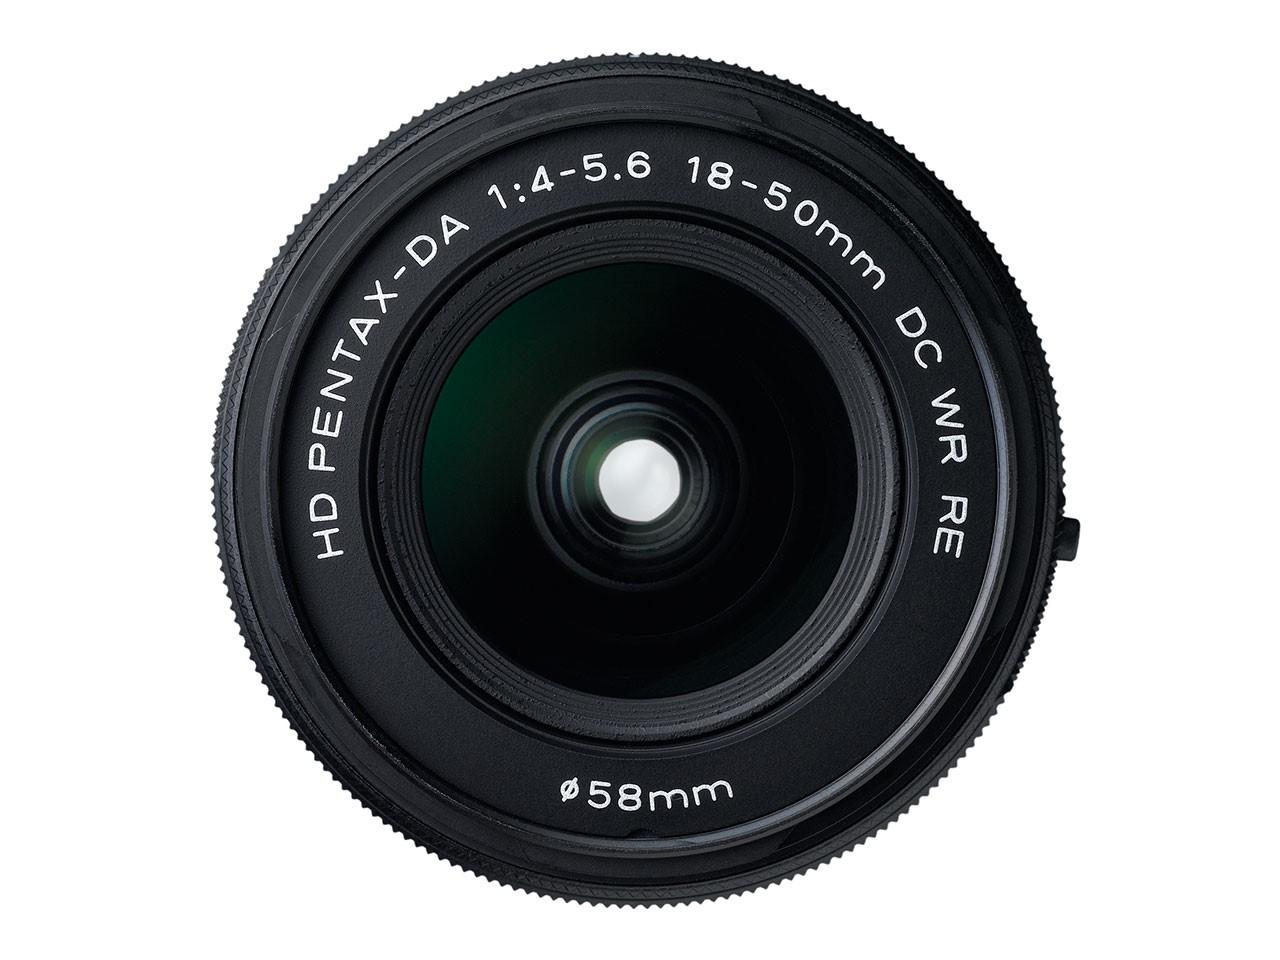 Imprimer Olympus 85mm F20 Lens Exploded Parts Diagram Pdf 0898602830v3050